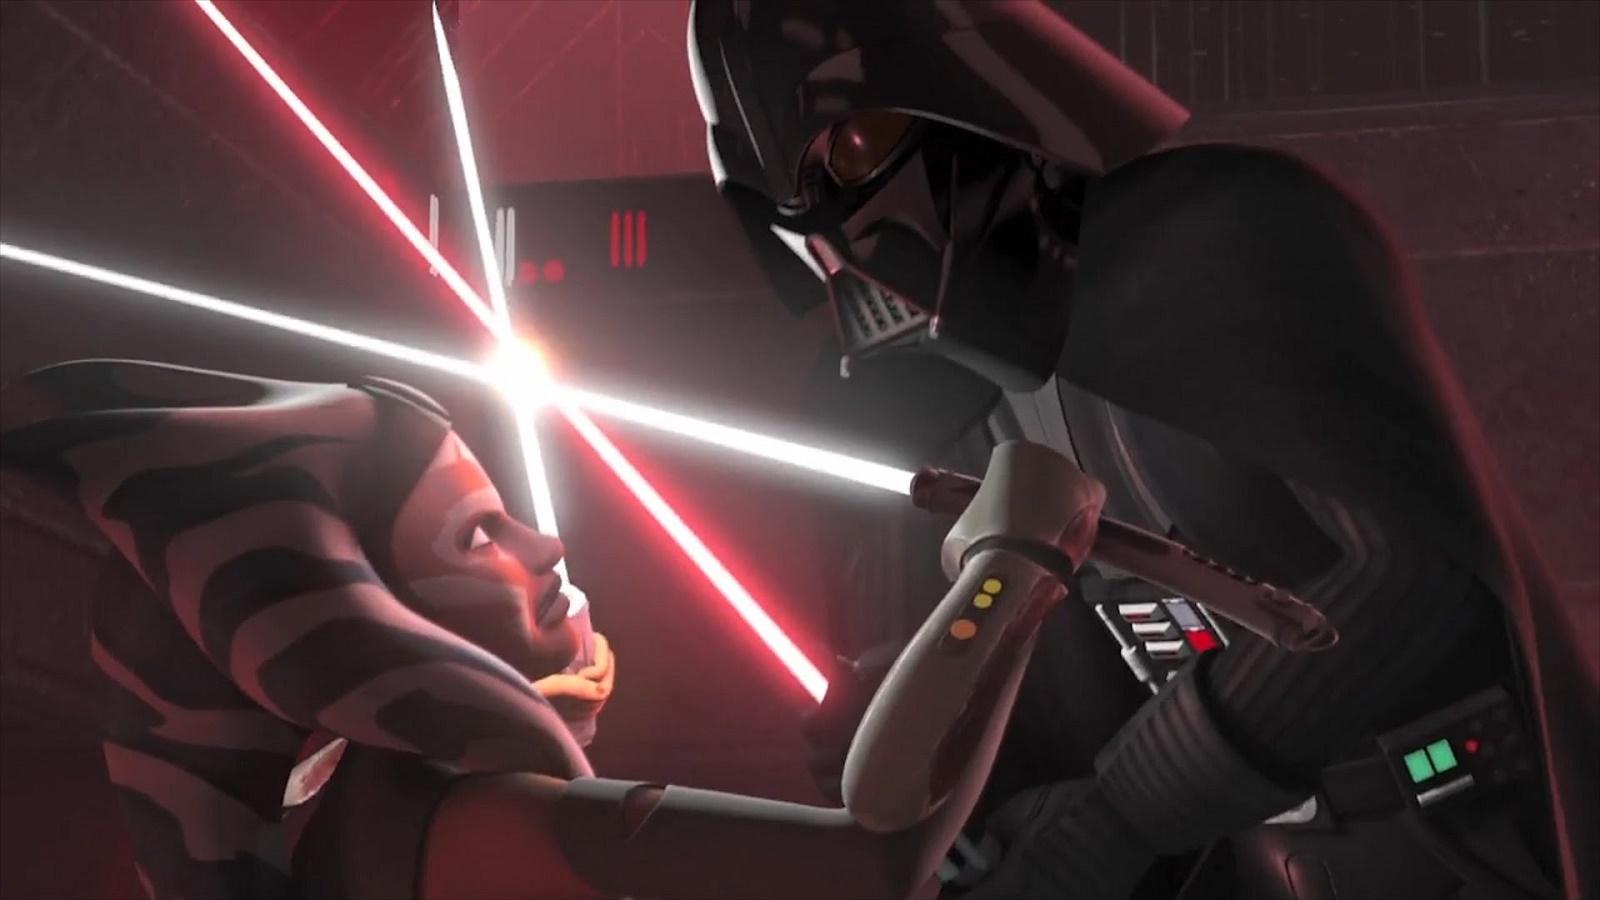 star wars rebels meet ahsoka and anakin